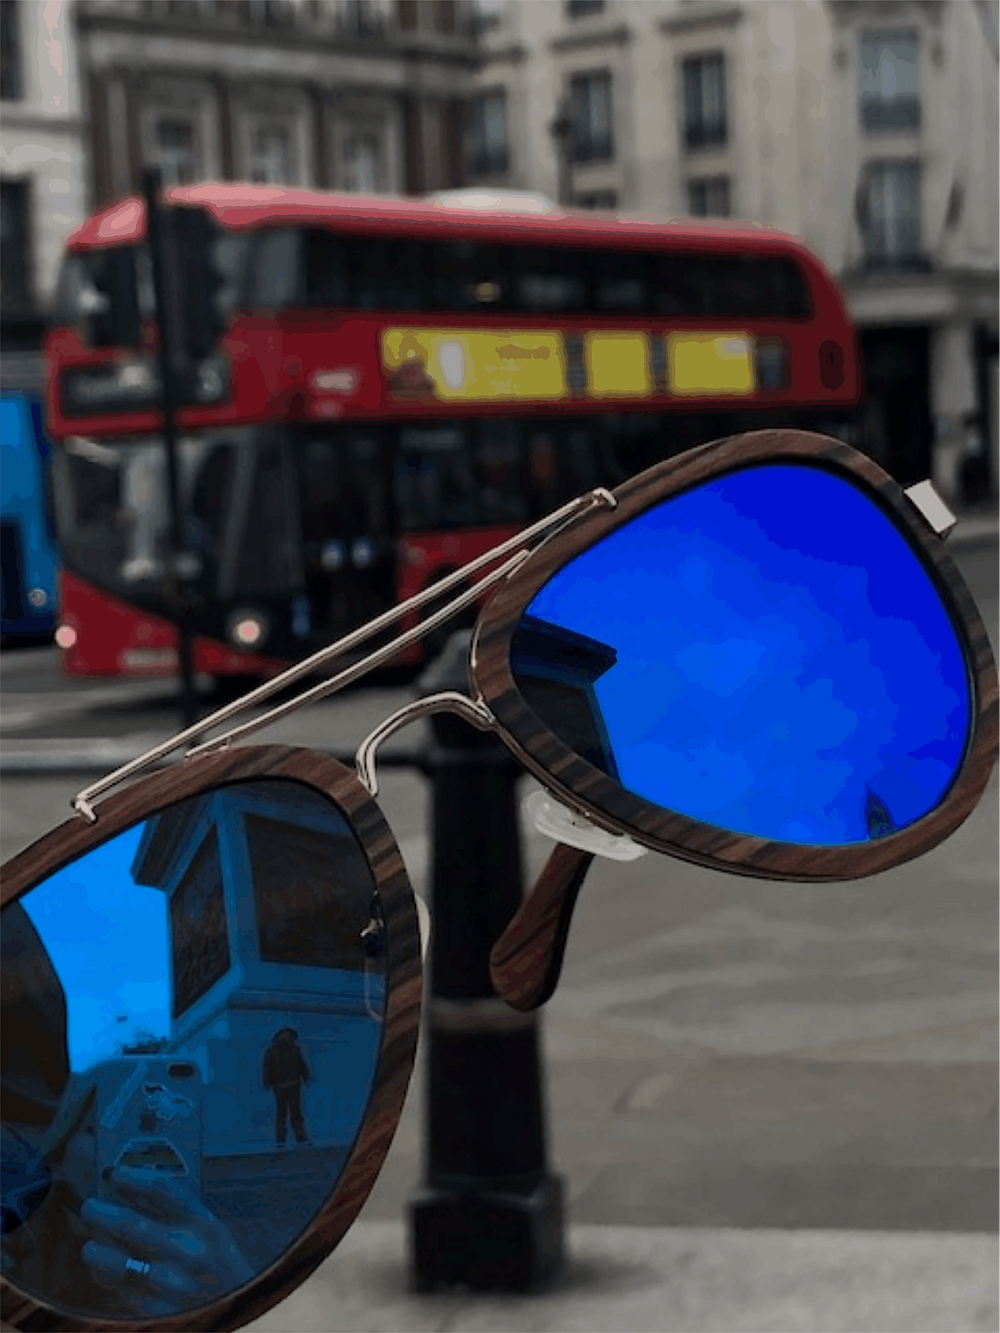 Tα γυαλιά Milos στο Λονδίνο με φόντο το κόκκινο λεωφορείο